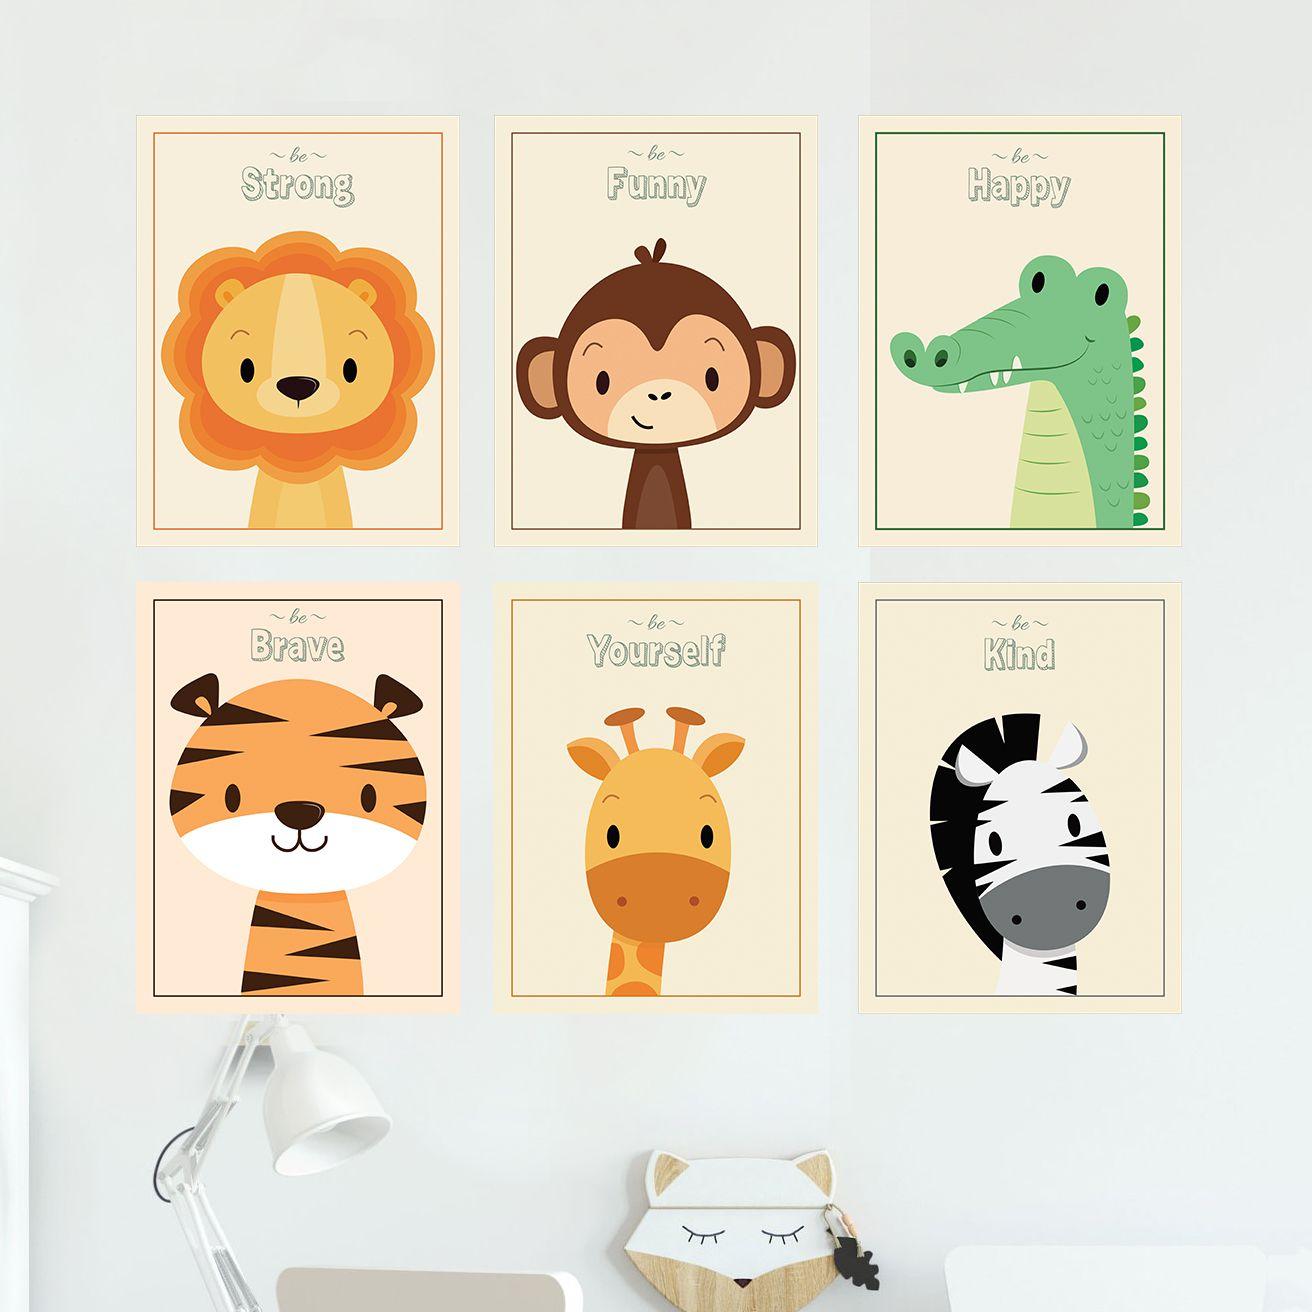 SAMYU CUTE SAFARI ANIMALS Paper Wall Poster Without Frame